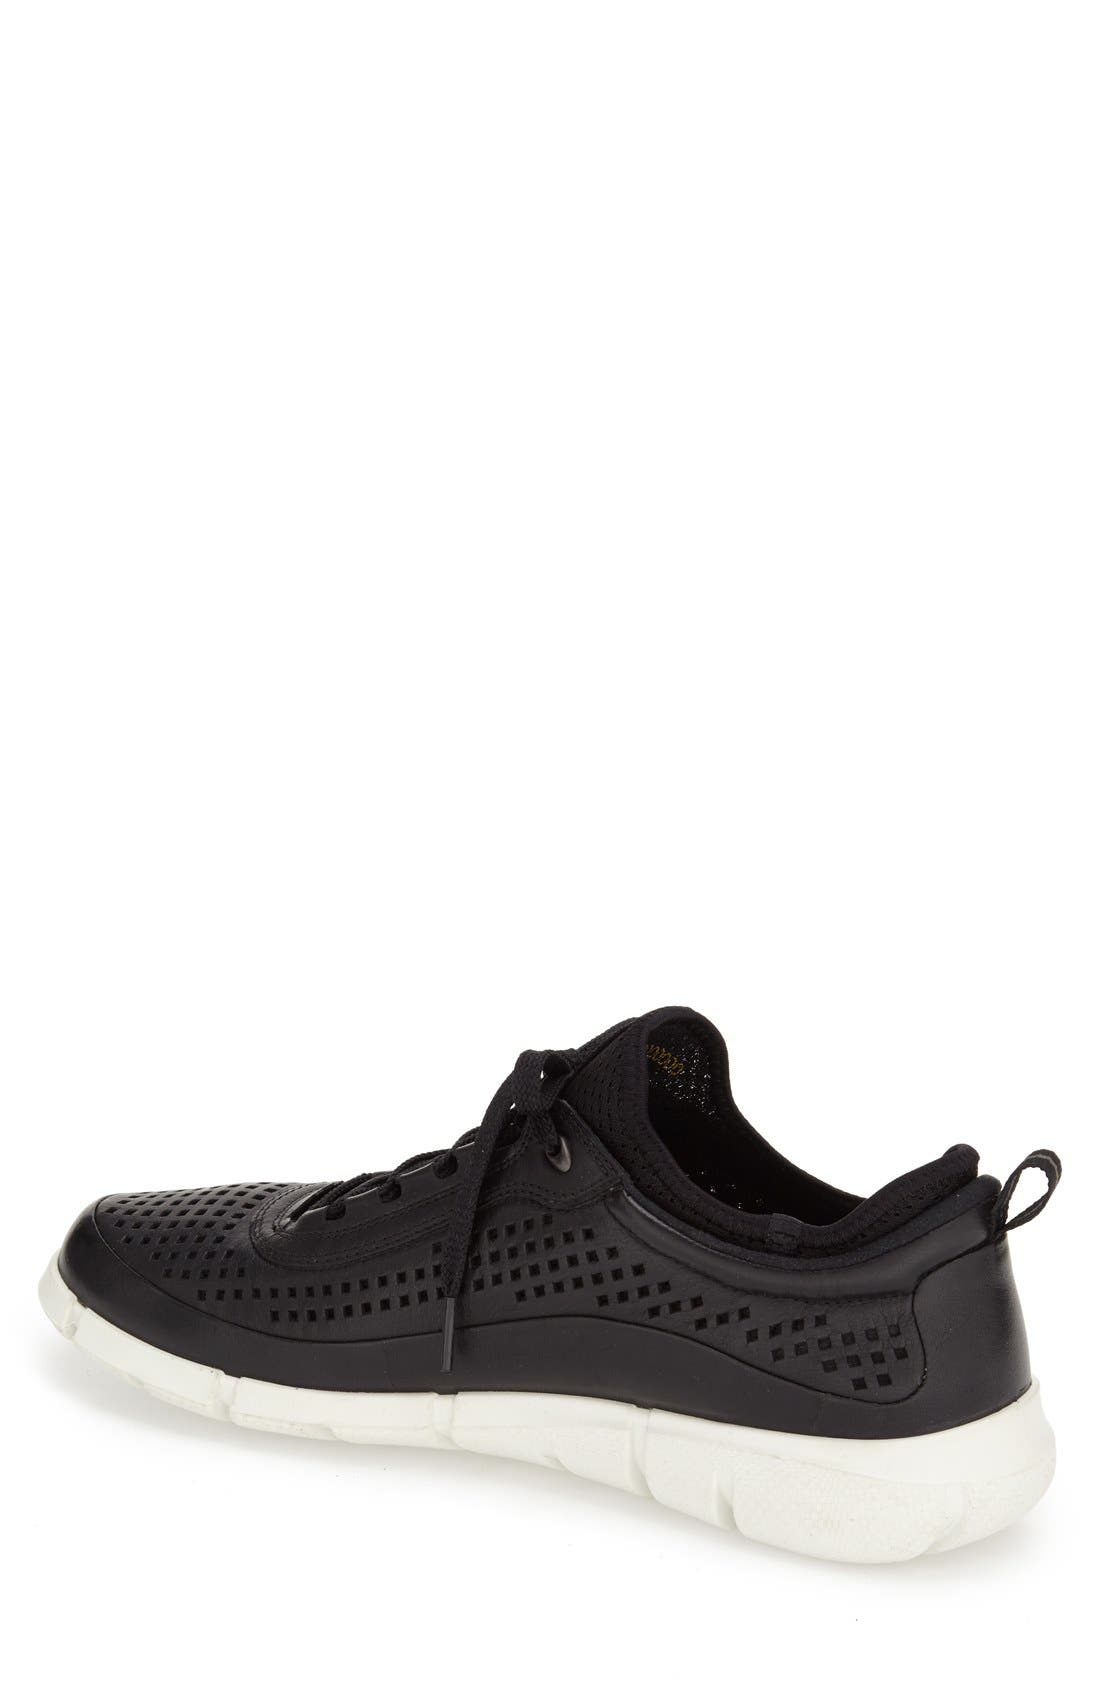 'Intrinsic' Sneaker,                             Alternate thumbnail 2, color,                             Black Leather